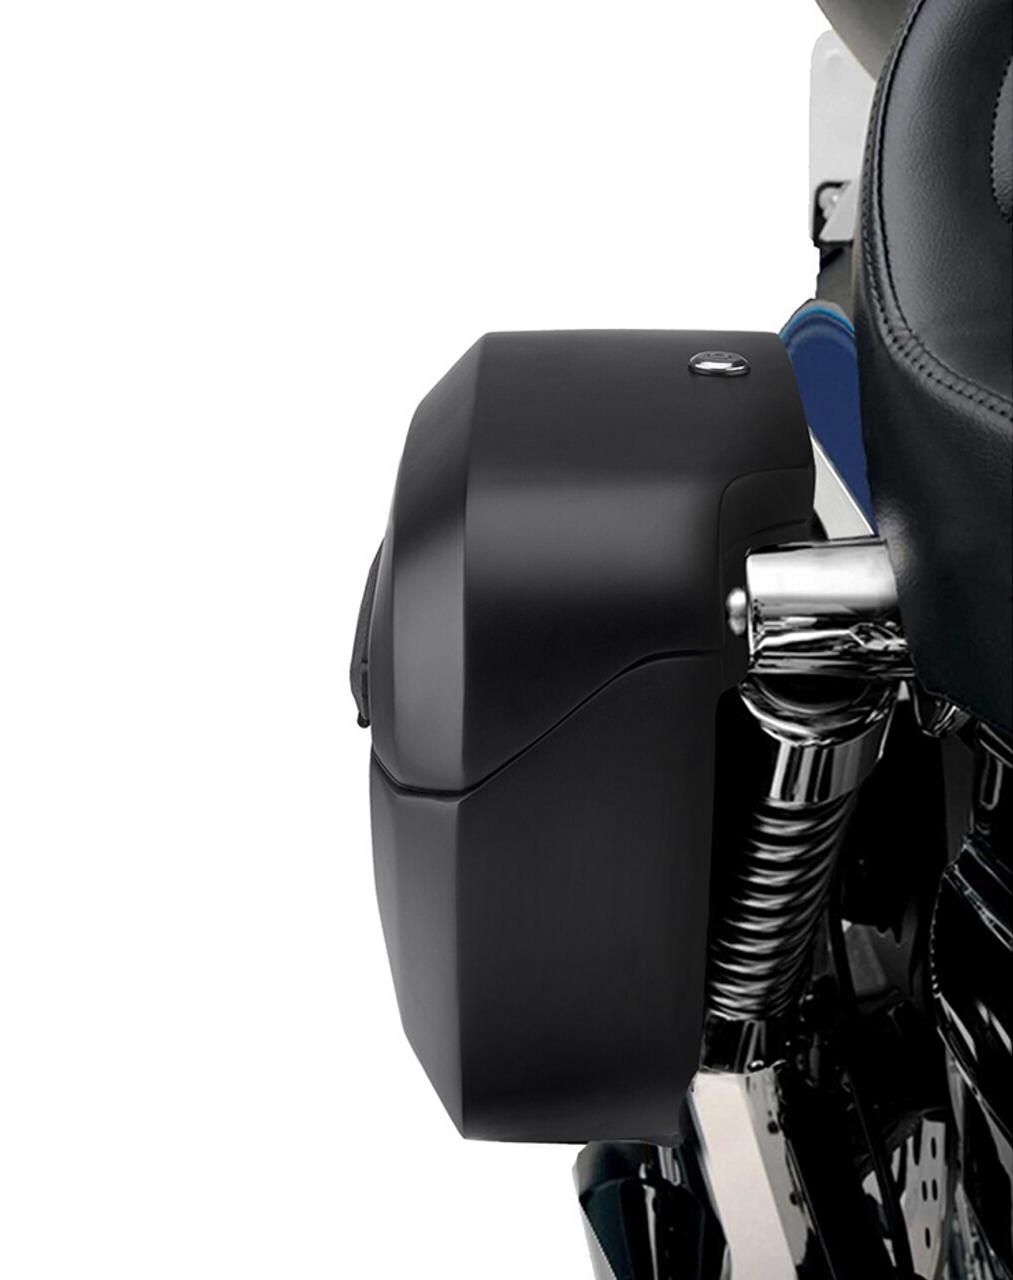 Viking Lamellar Shock Cutout Large Matte Motorcycle Hard Saddlebags For Harley Dyna Fat Bob FXDF Shock Cutout View